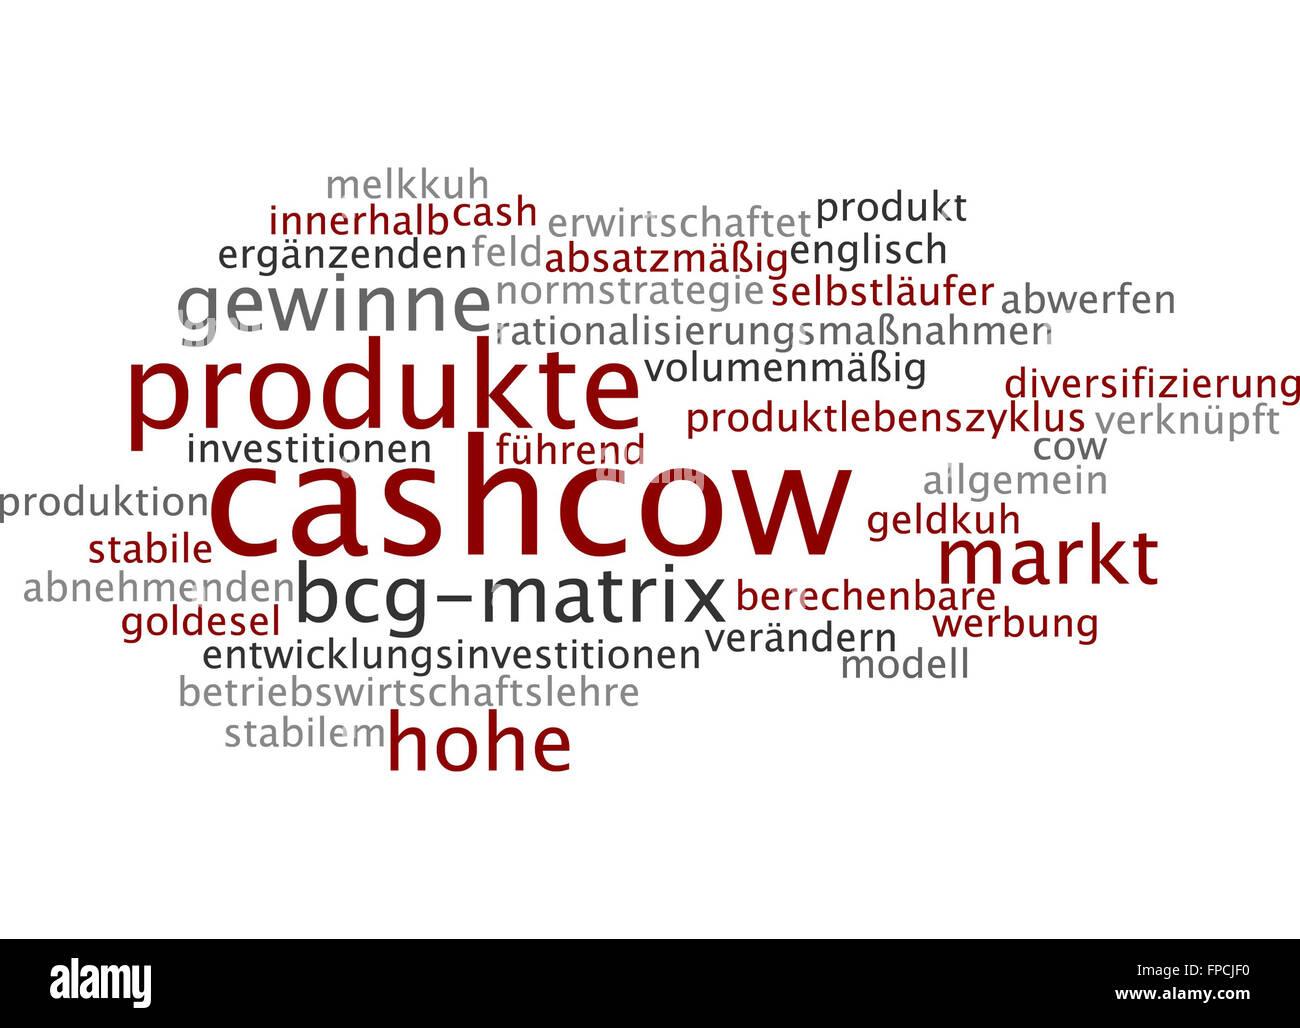 Cashcow Cashkuh Kuh Cow Cash Geld Gewinn Stock Photo